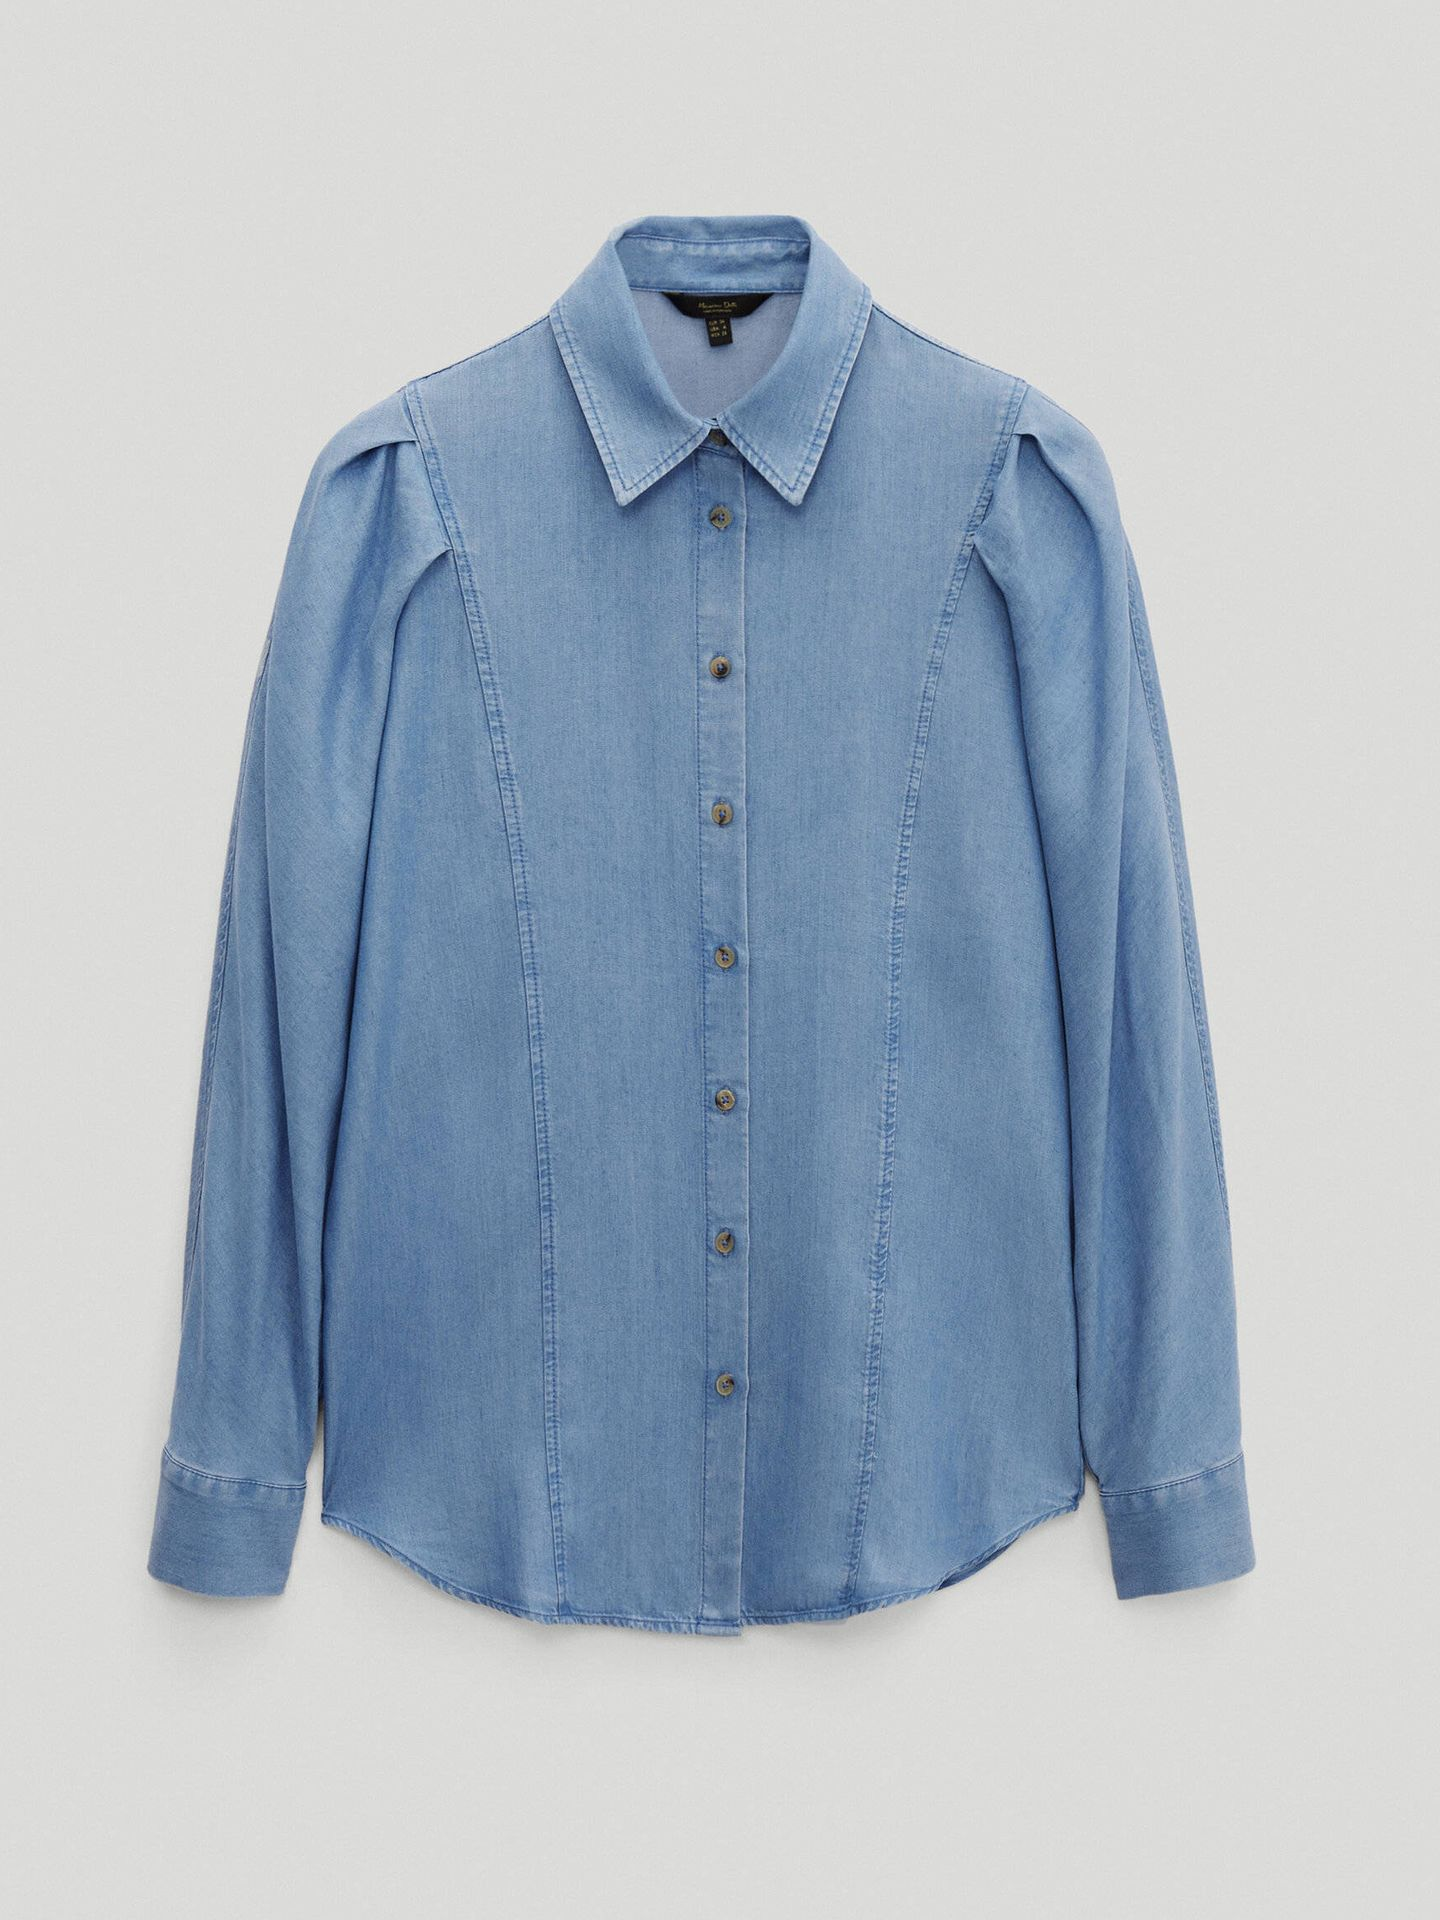 Camisa denim de Massimo Dutti. (Cortesía)